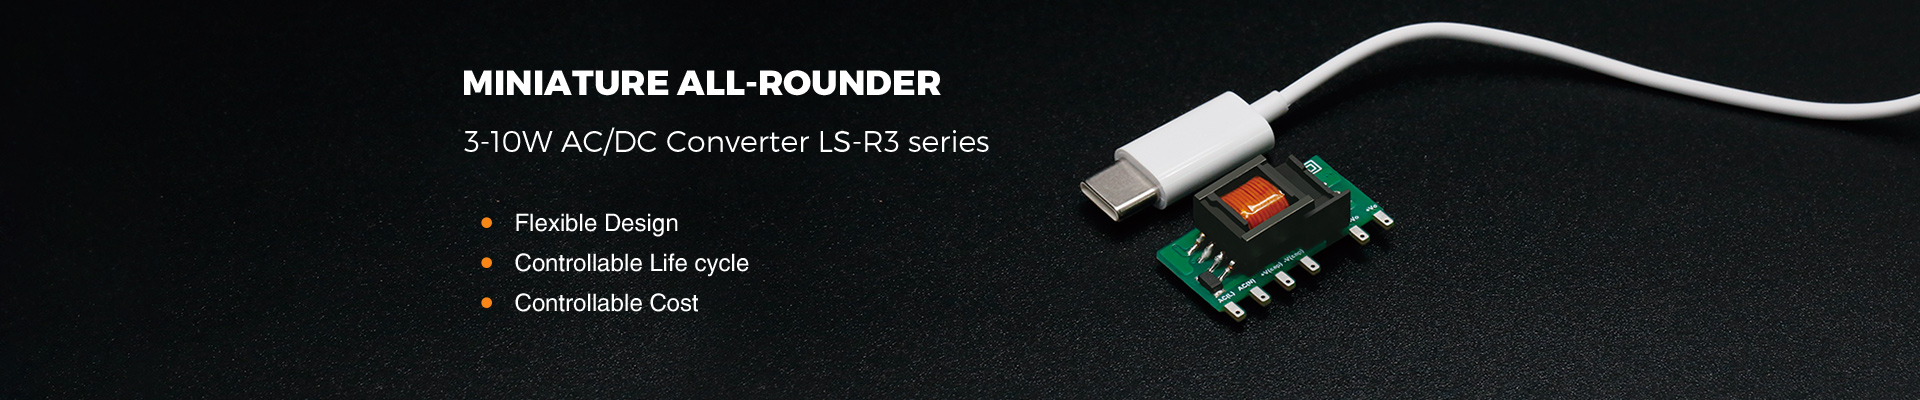 Miniature All-rounder, 3-10W AC/DC Converter LS-R3 series